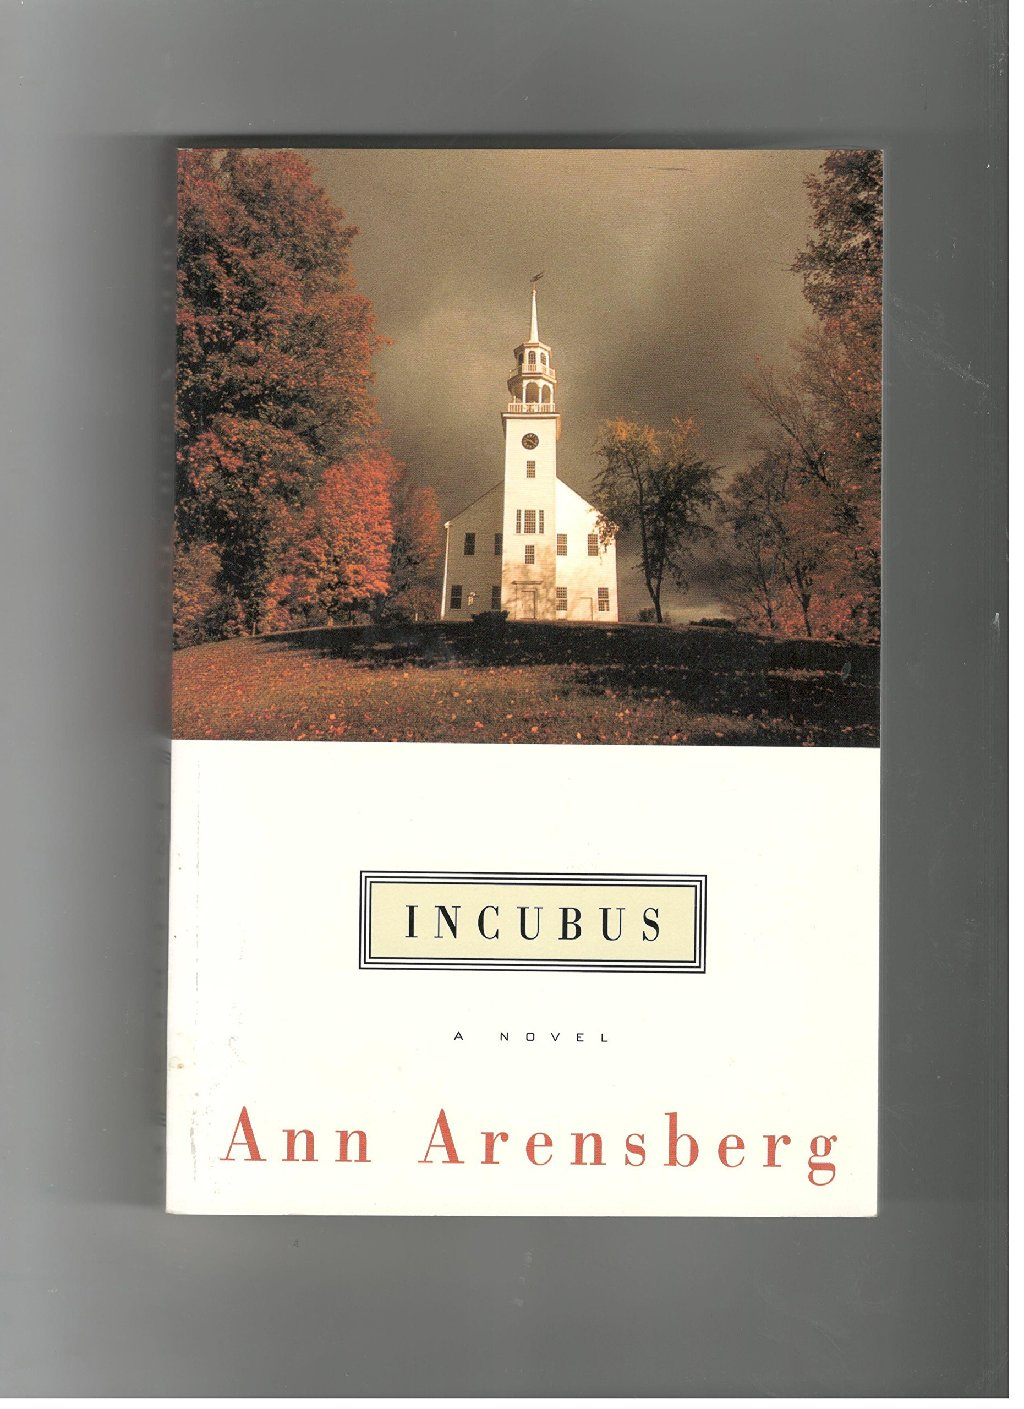 INCUBUS ANN ARENSBERG